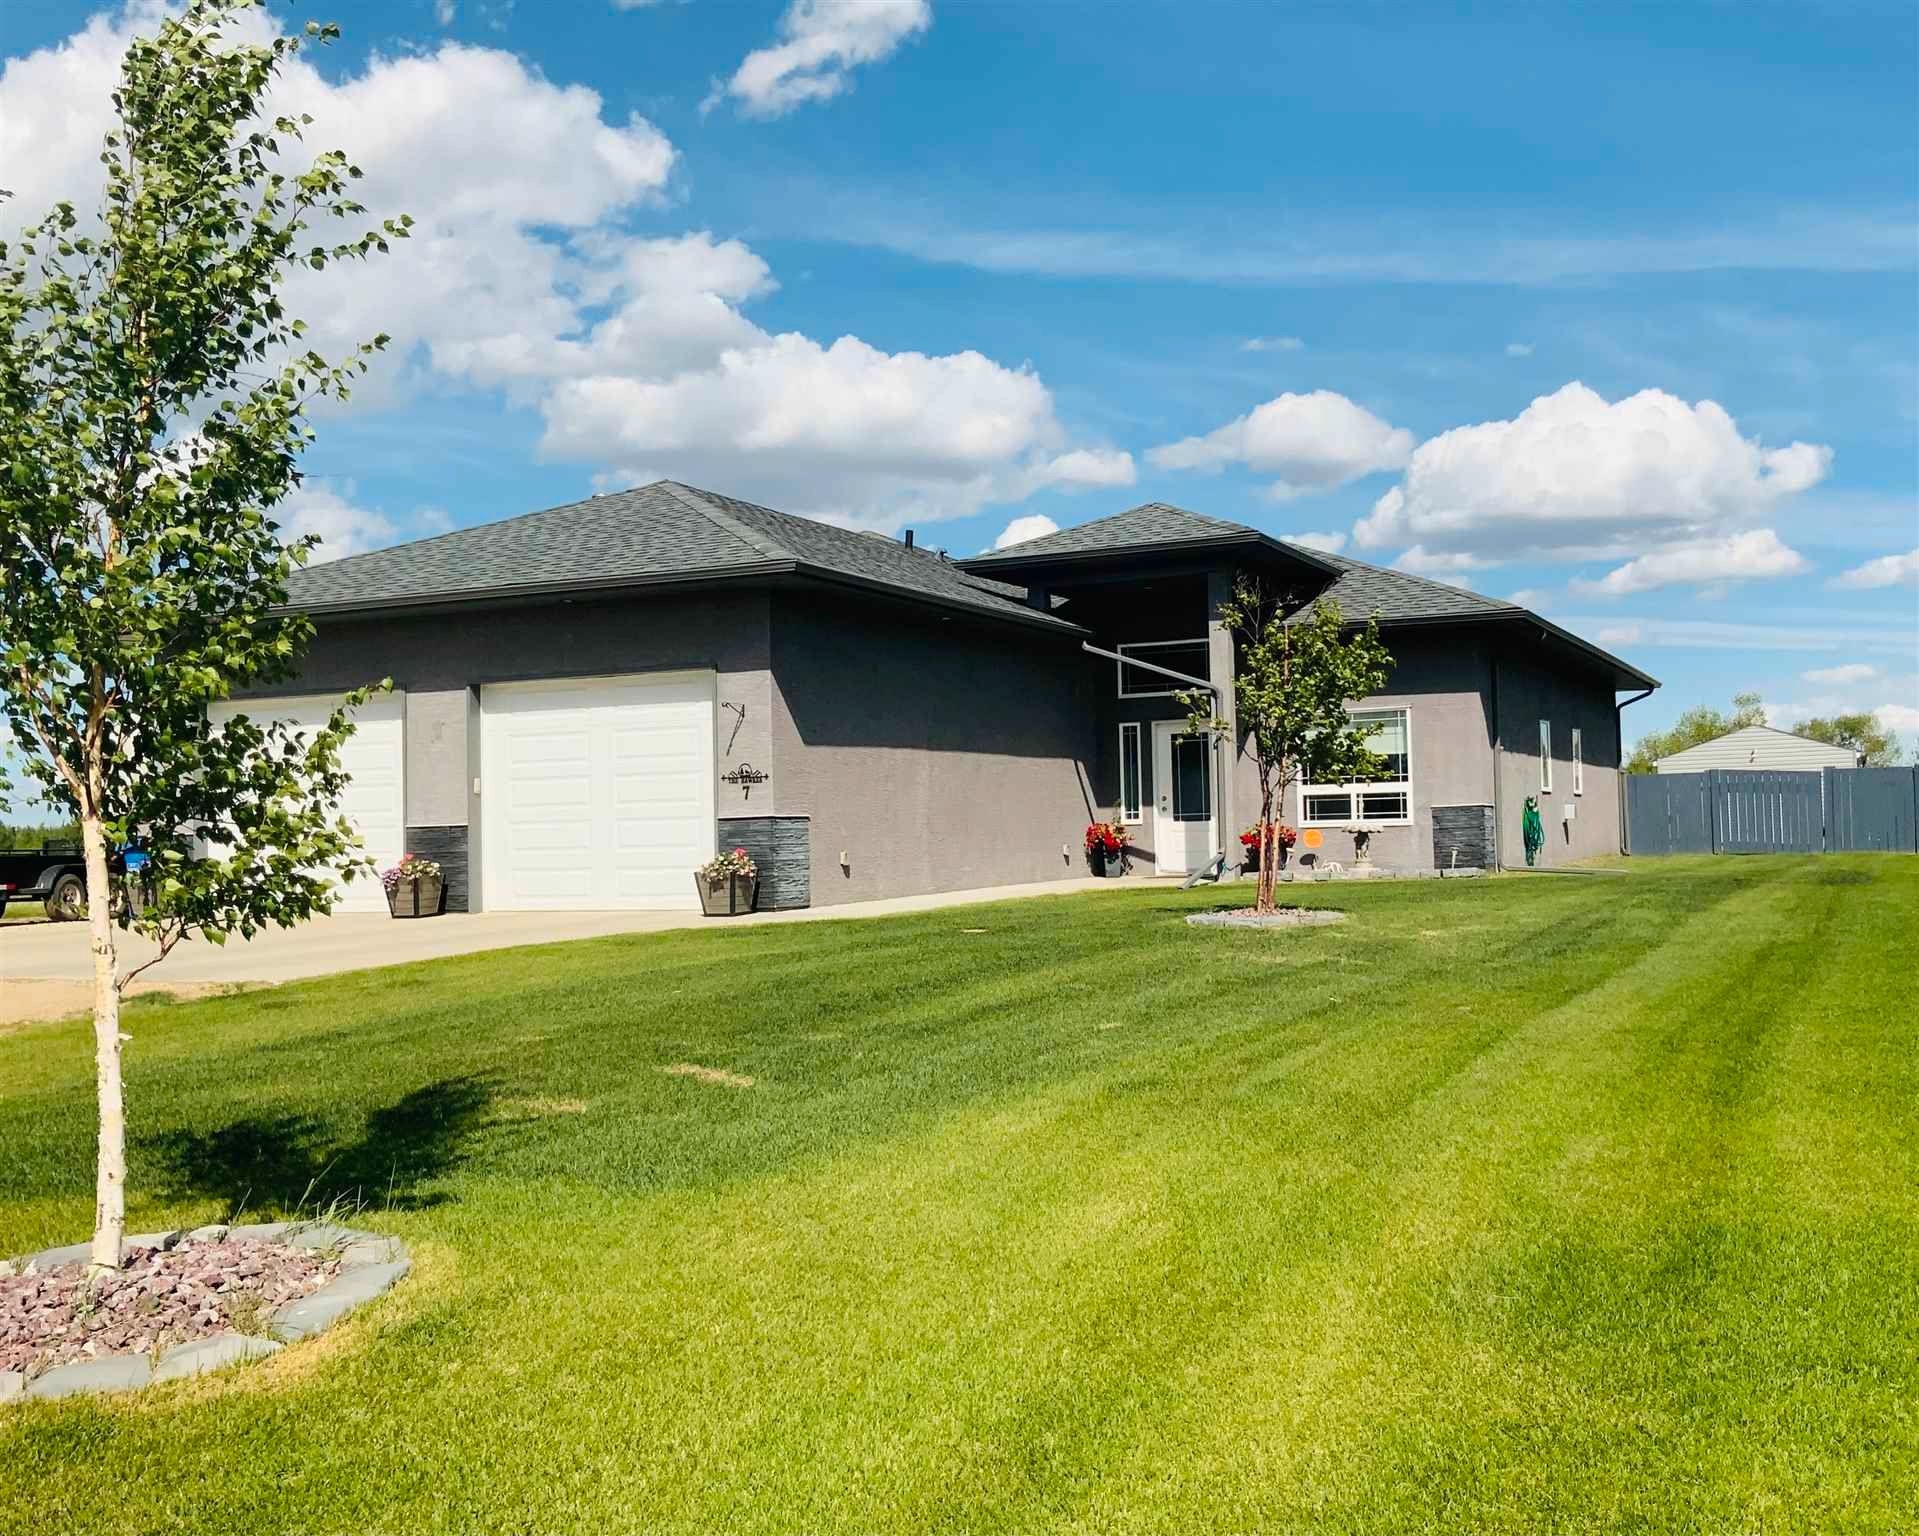 Main Photo: 7 Evergreen Close: Wetaskiwin House for sale : MLS®# E4230056